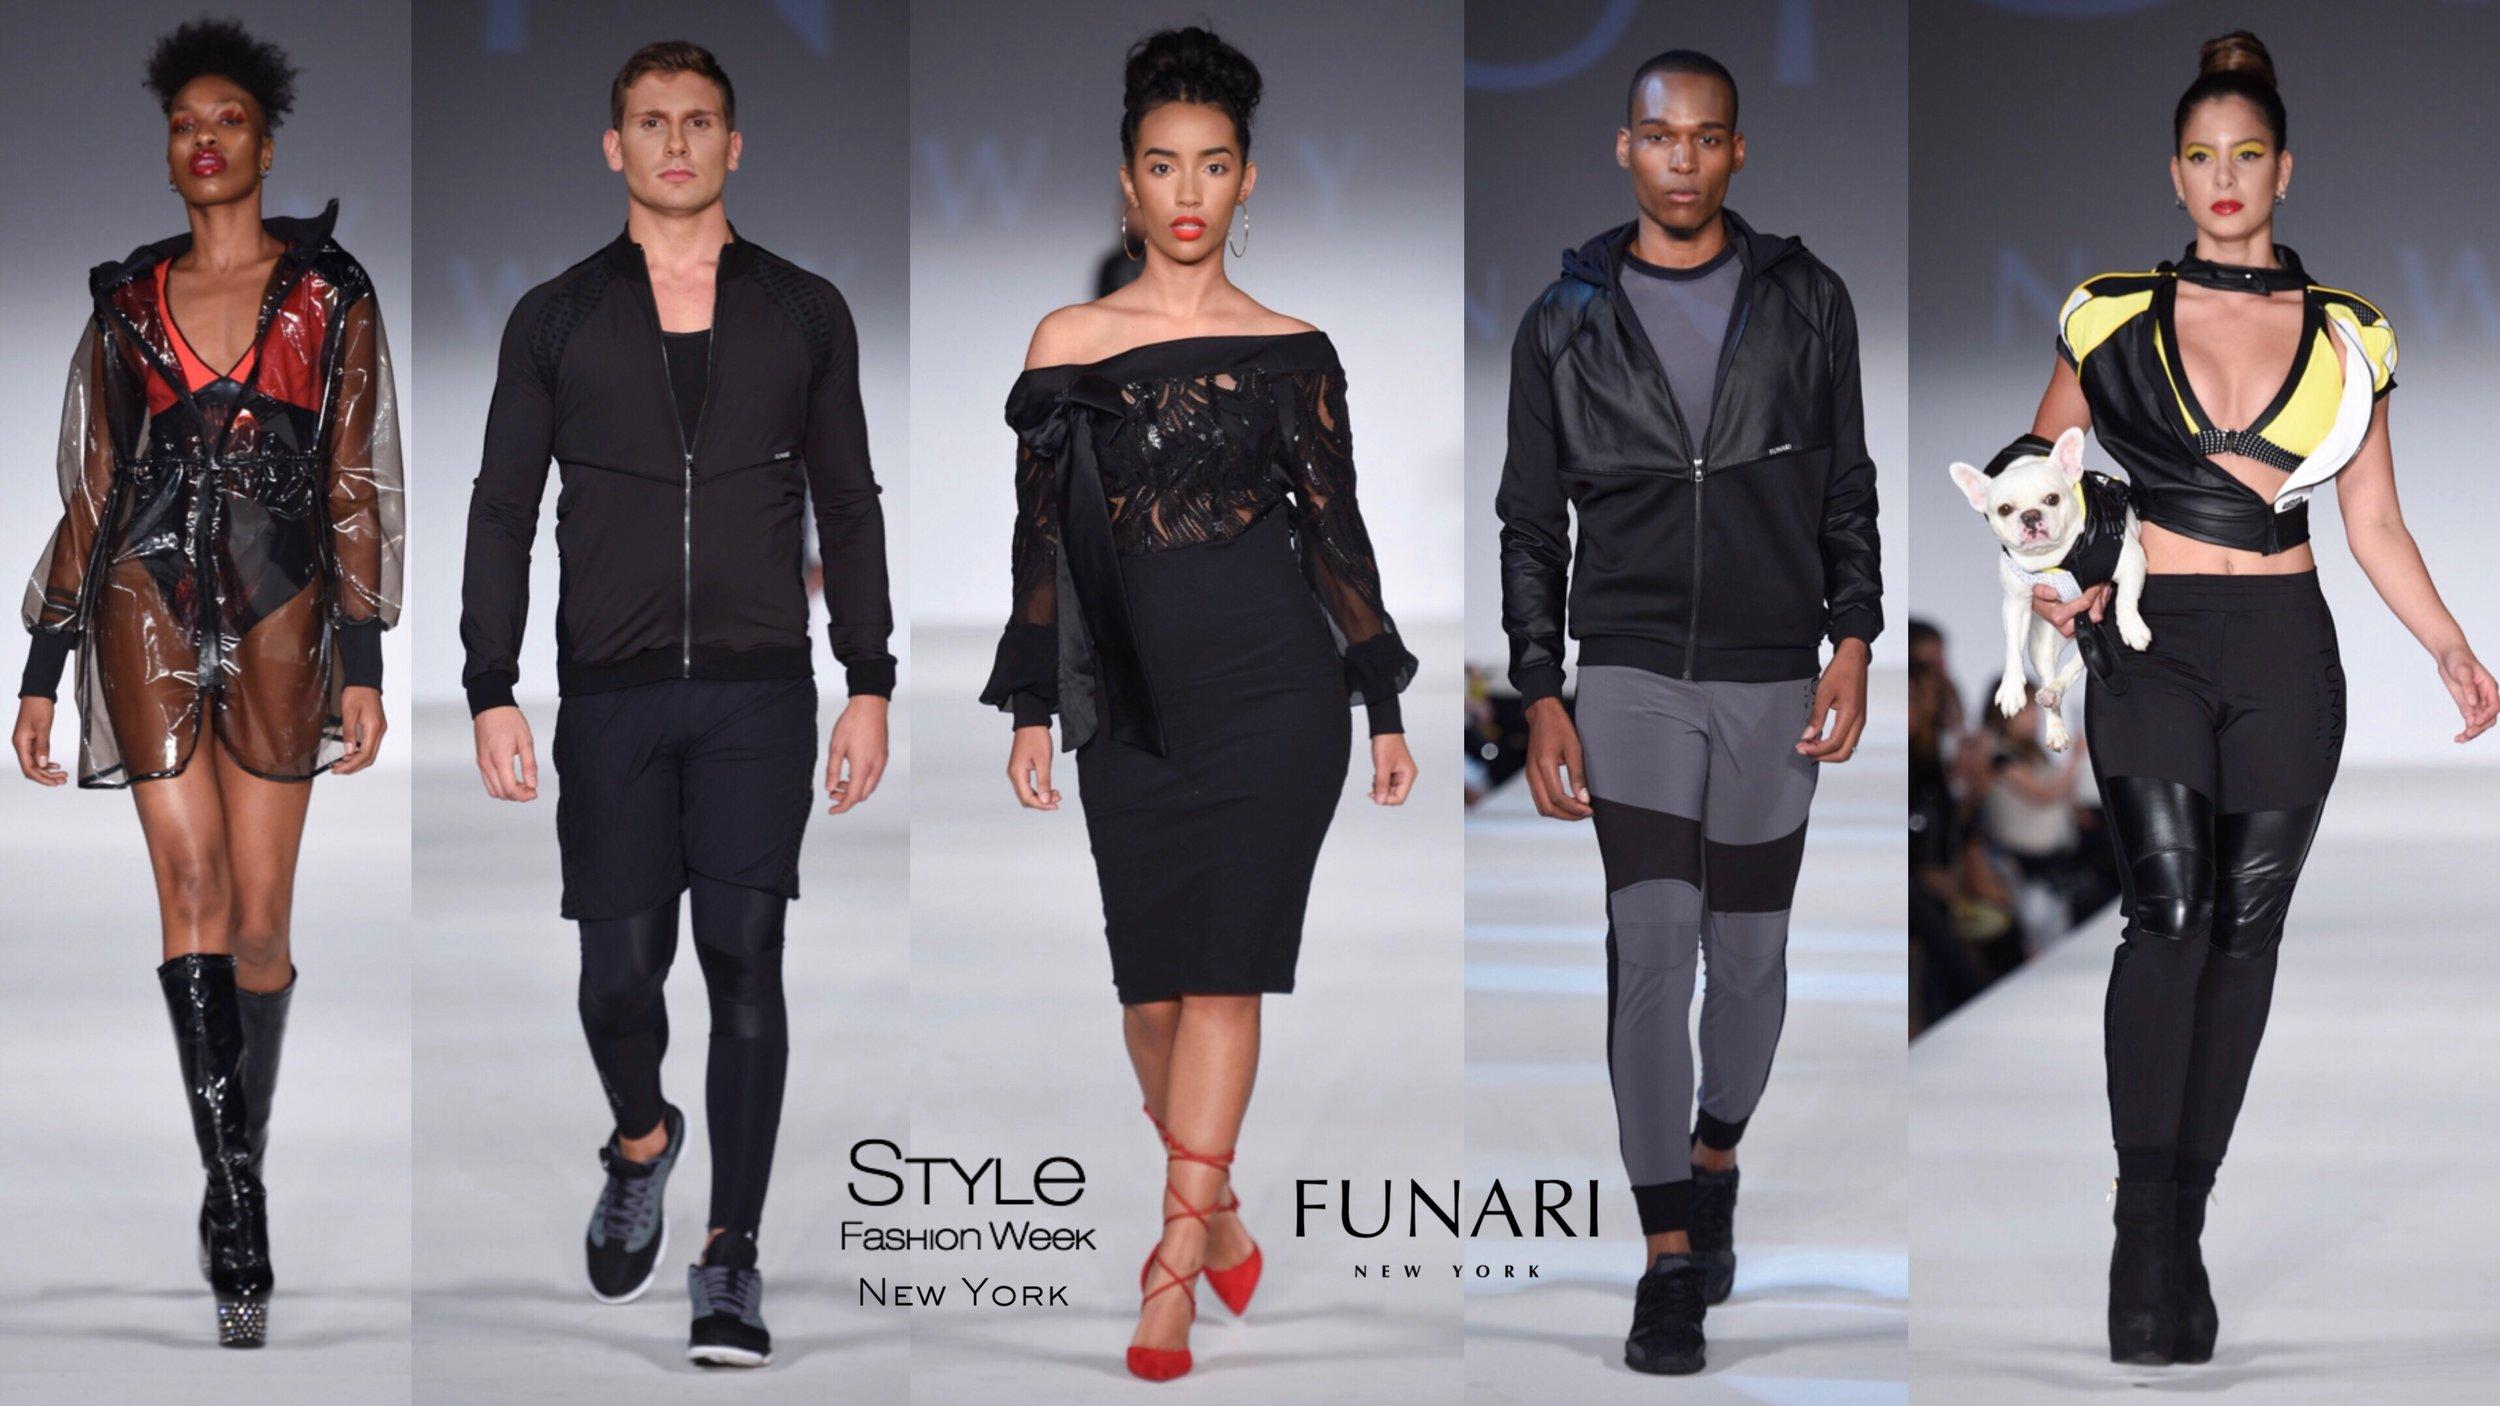 Photo Credit: STYLE Fashion Week Mark Gunter